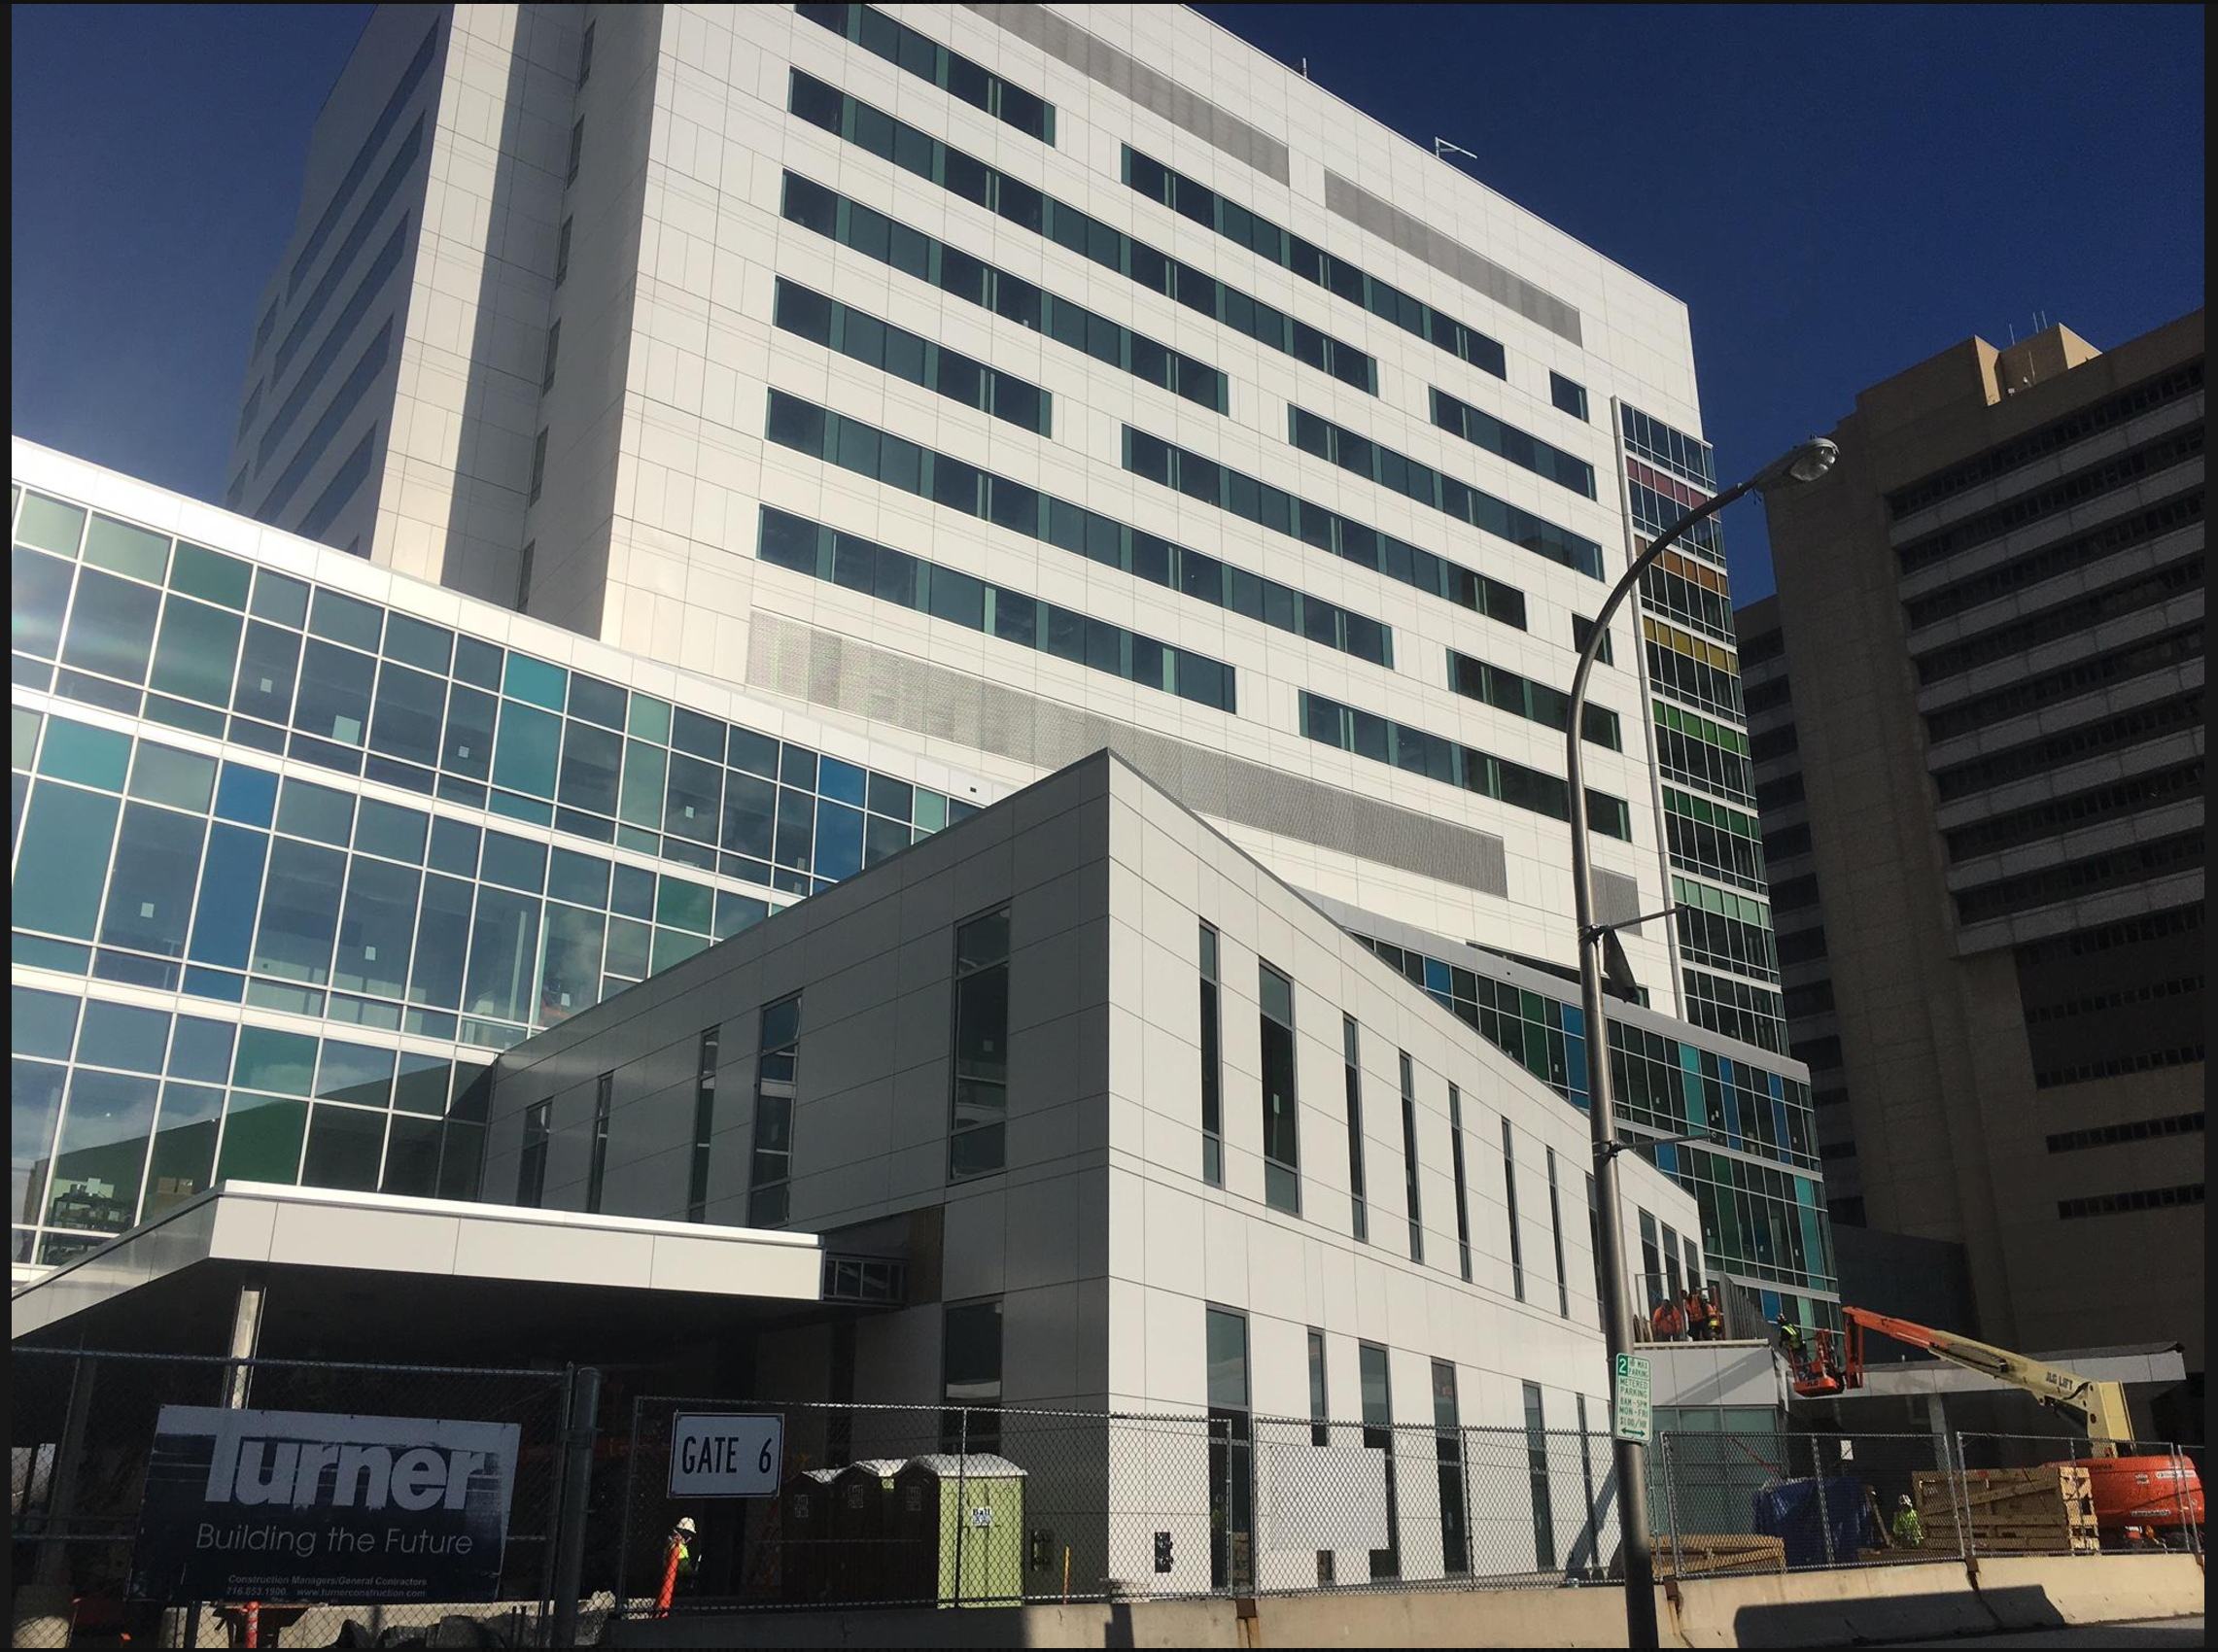 FOREIGNERS INVEST $50 MILLION IN OISHEI CHILDREN'S HOSPITAL